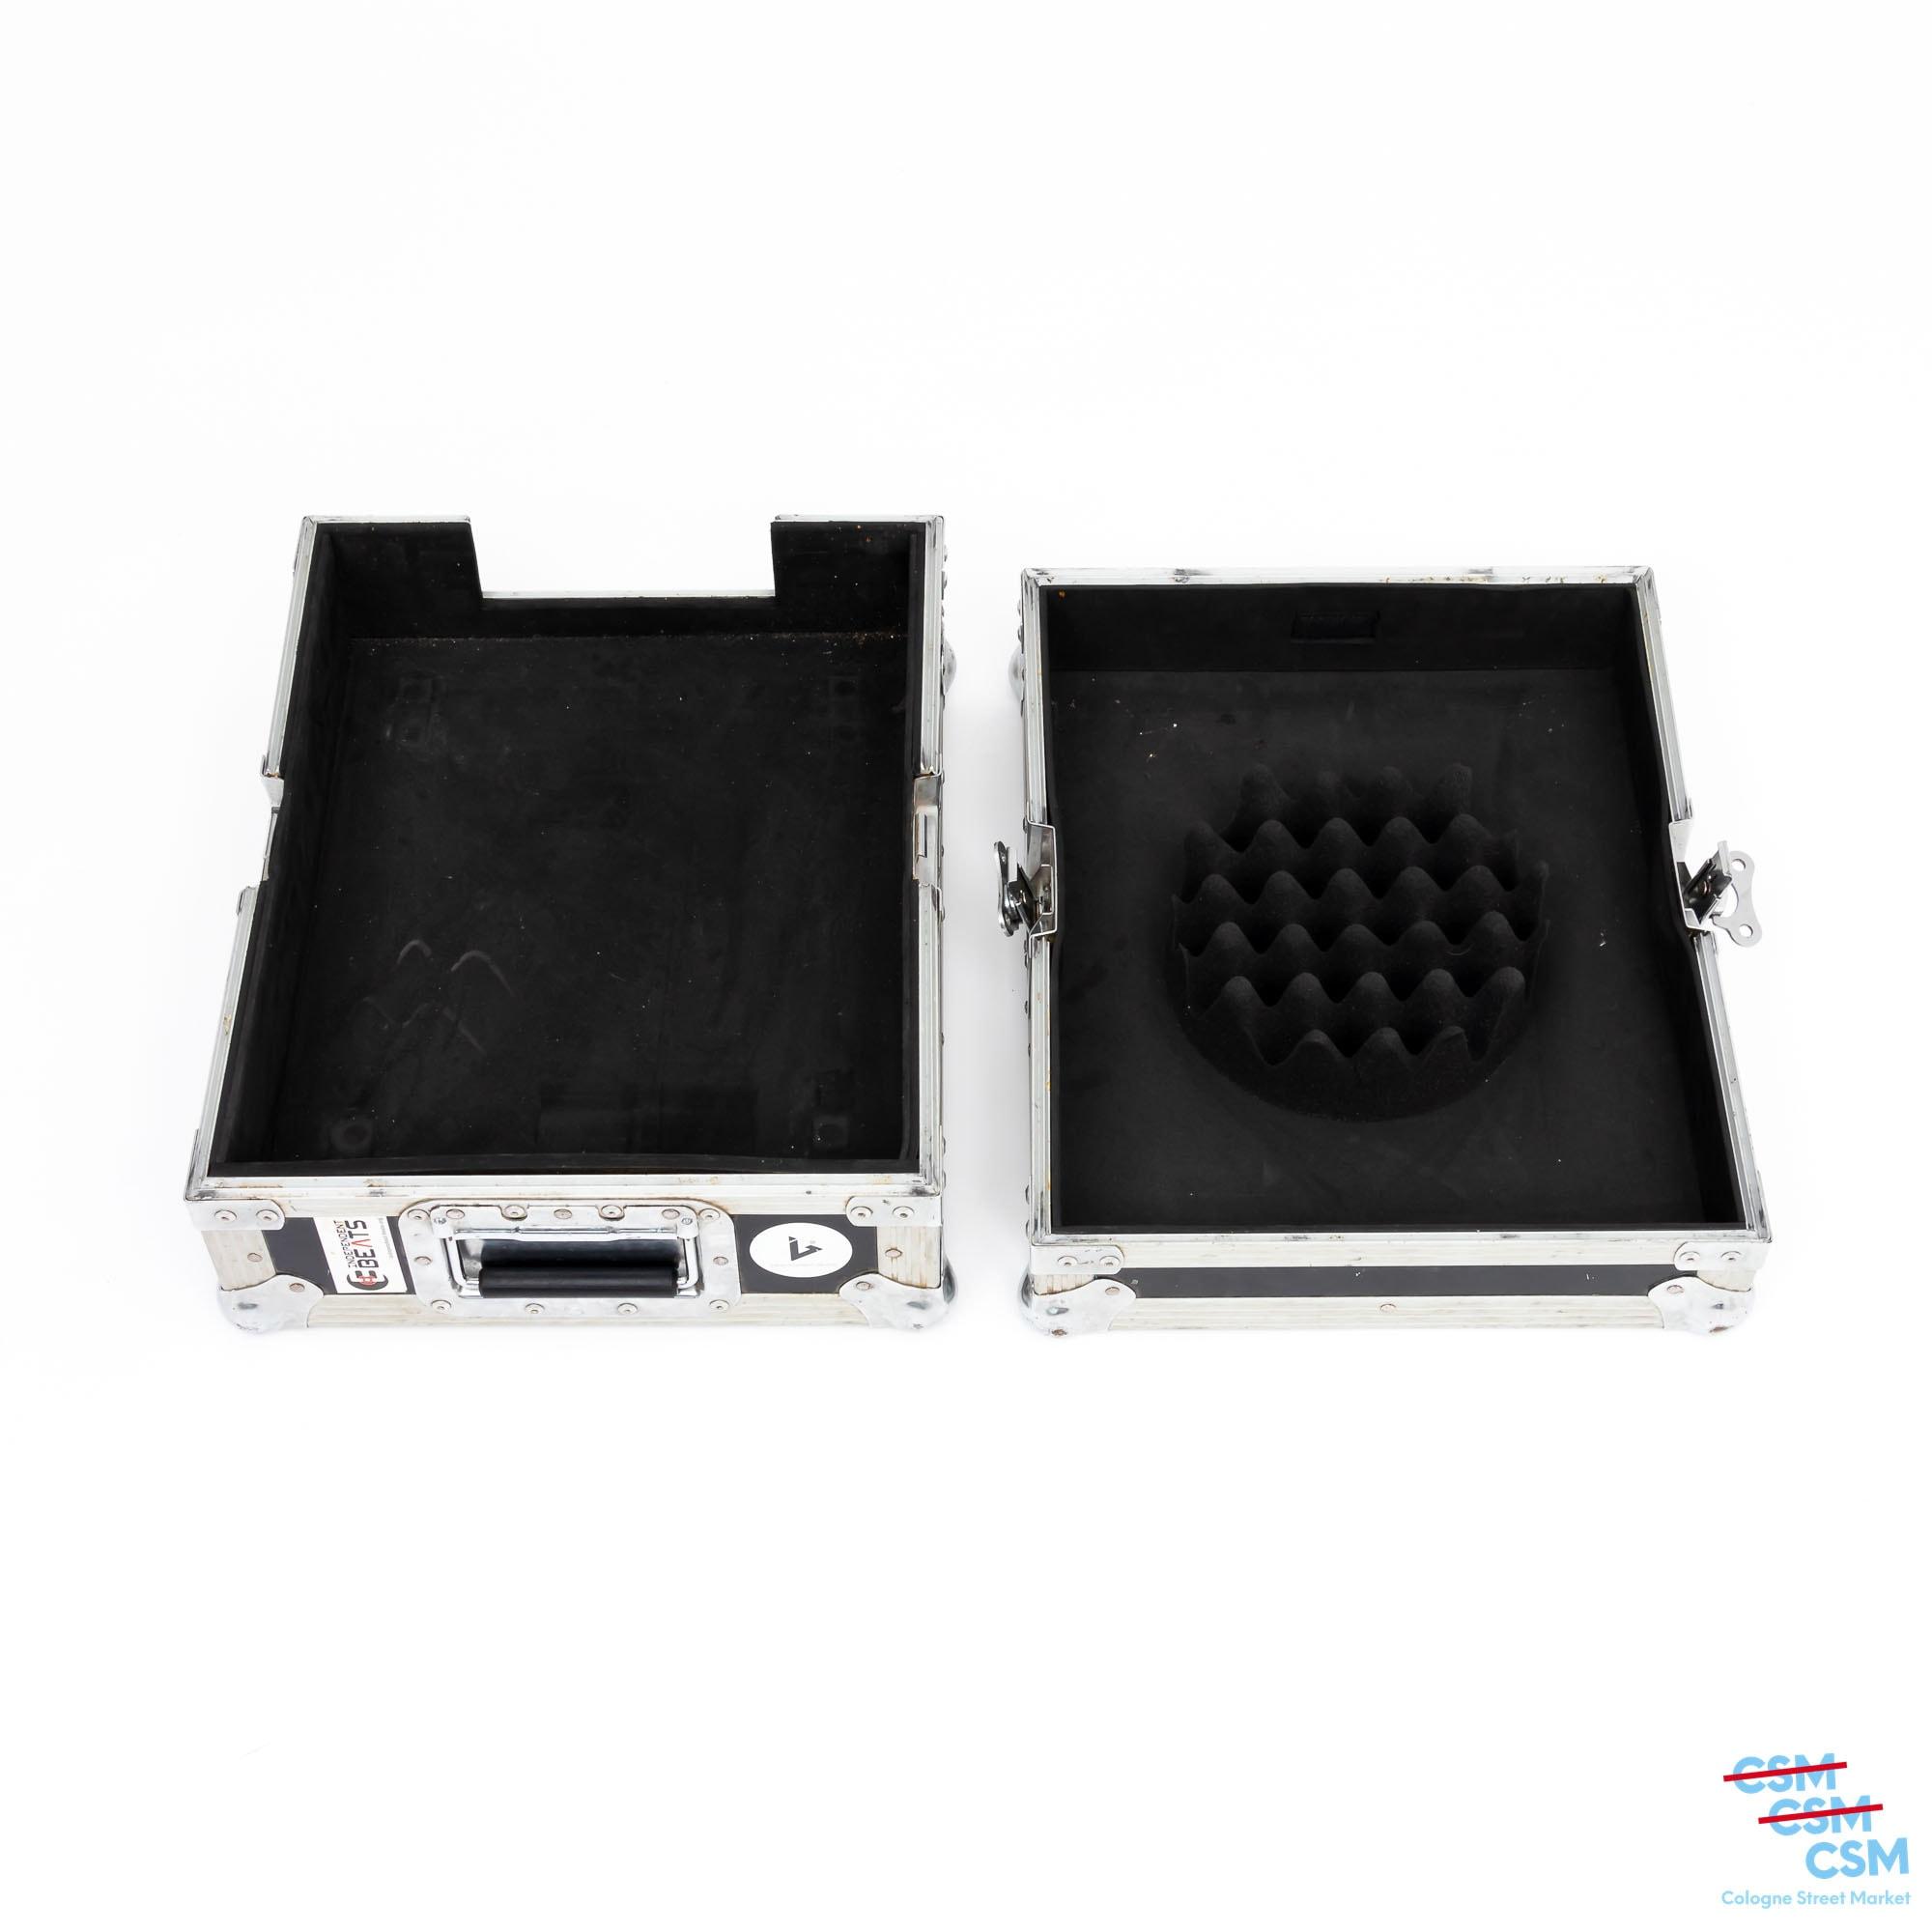 Fligthcase-CDJ-2000-Nexus-gebraucht-outlet-6